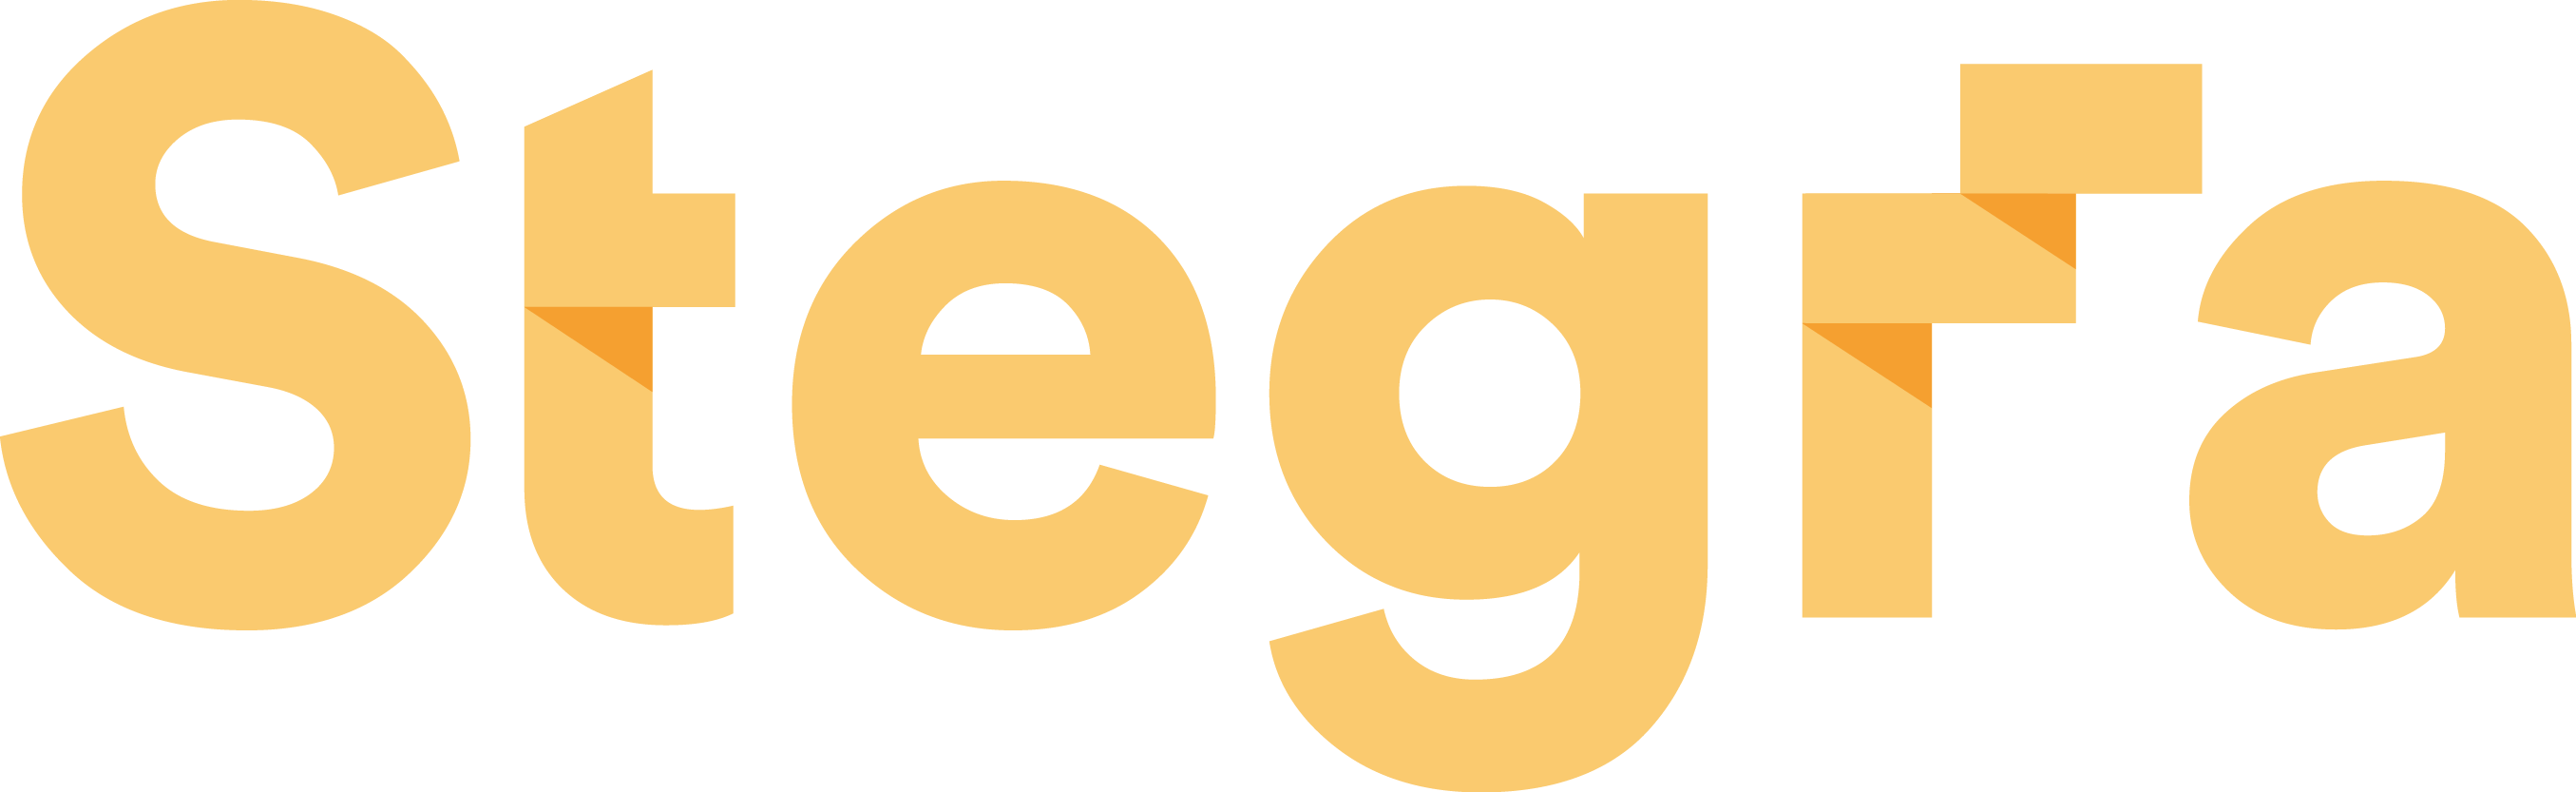 Stegra